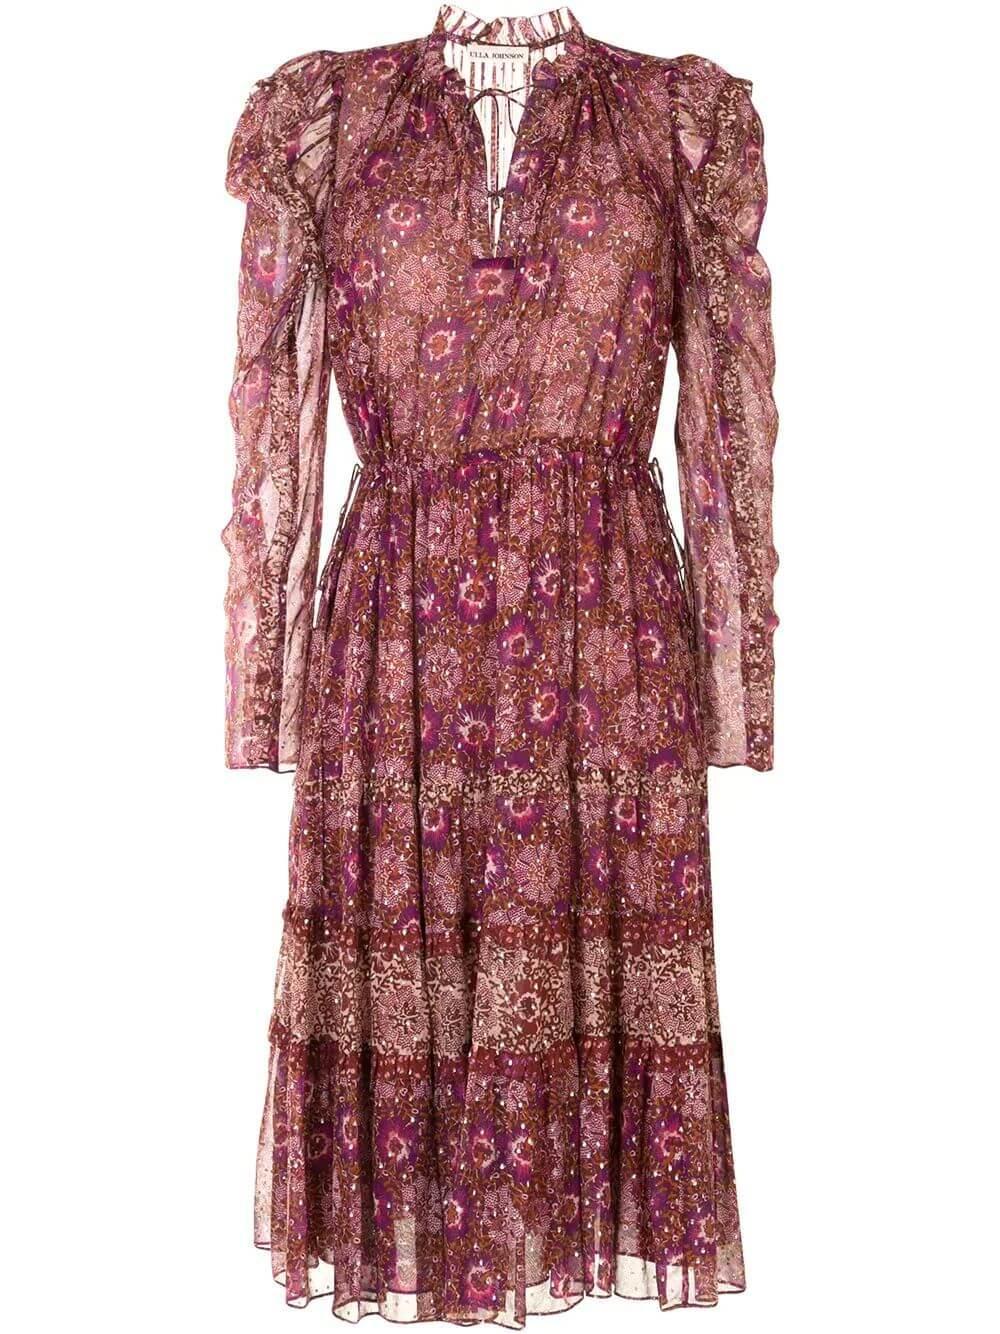 Alessandra Patchwork Dress Item # FA200124